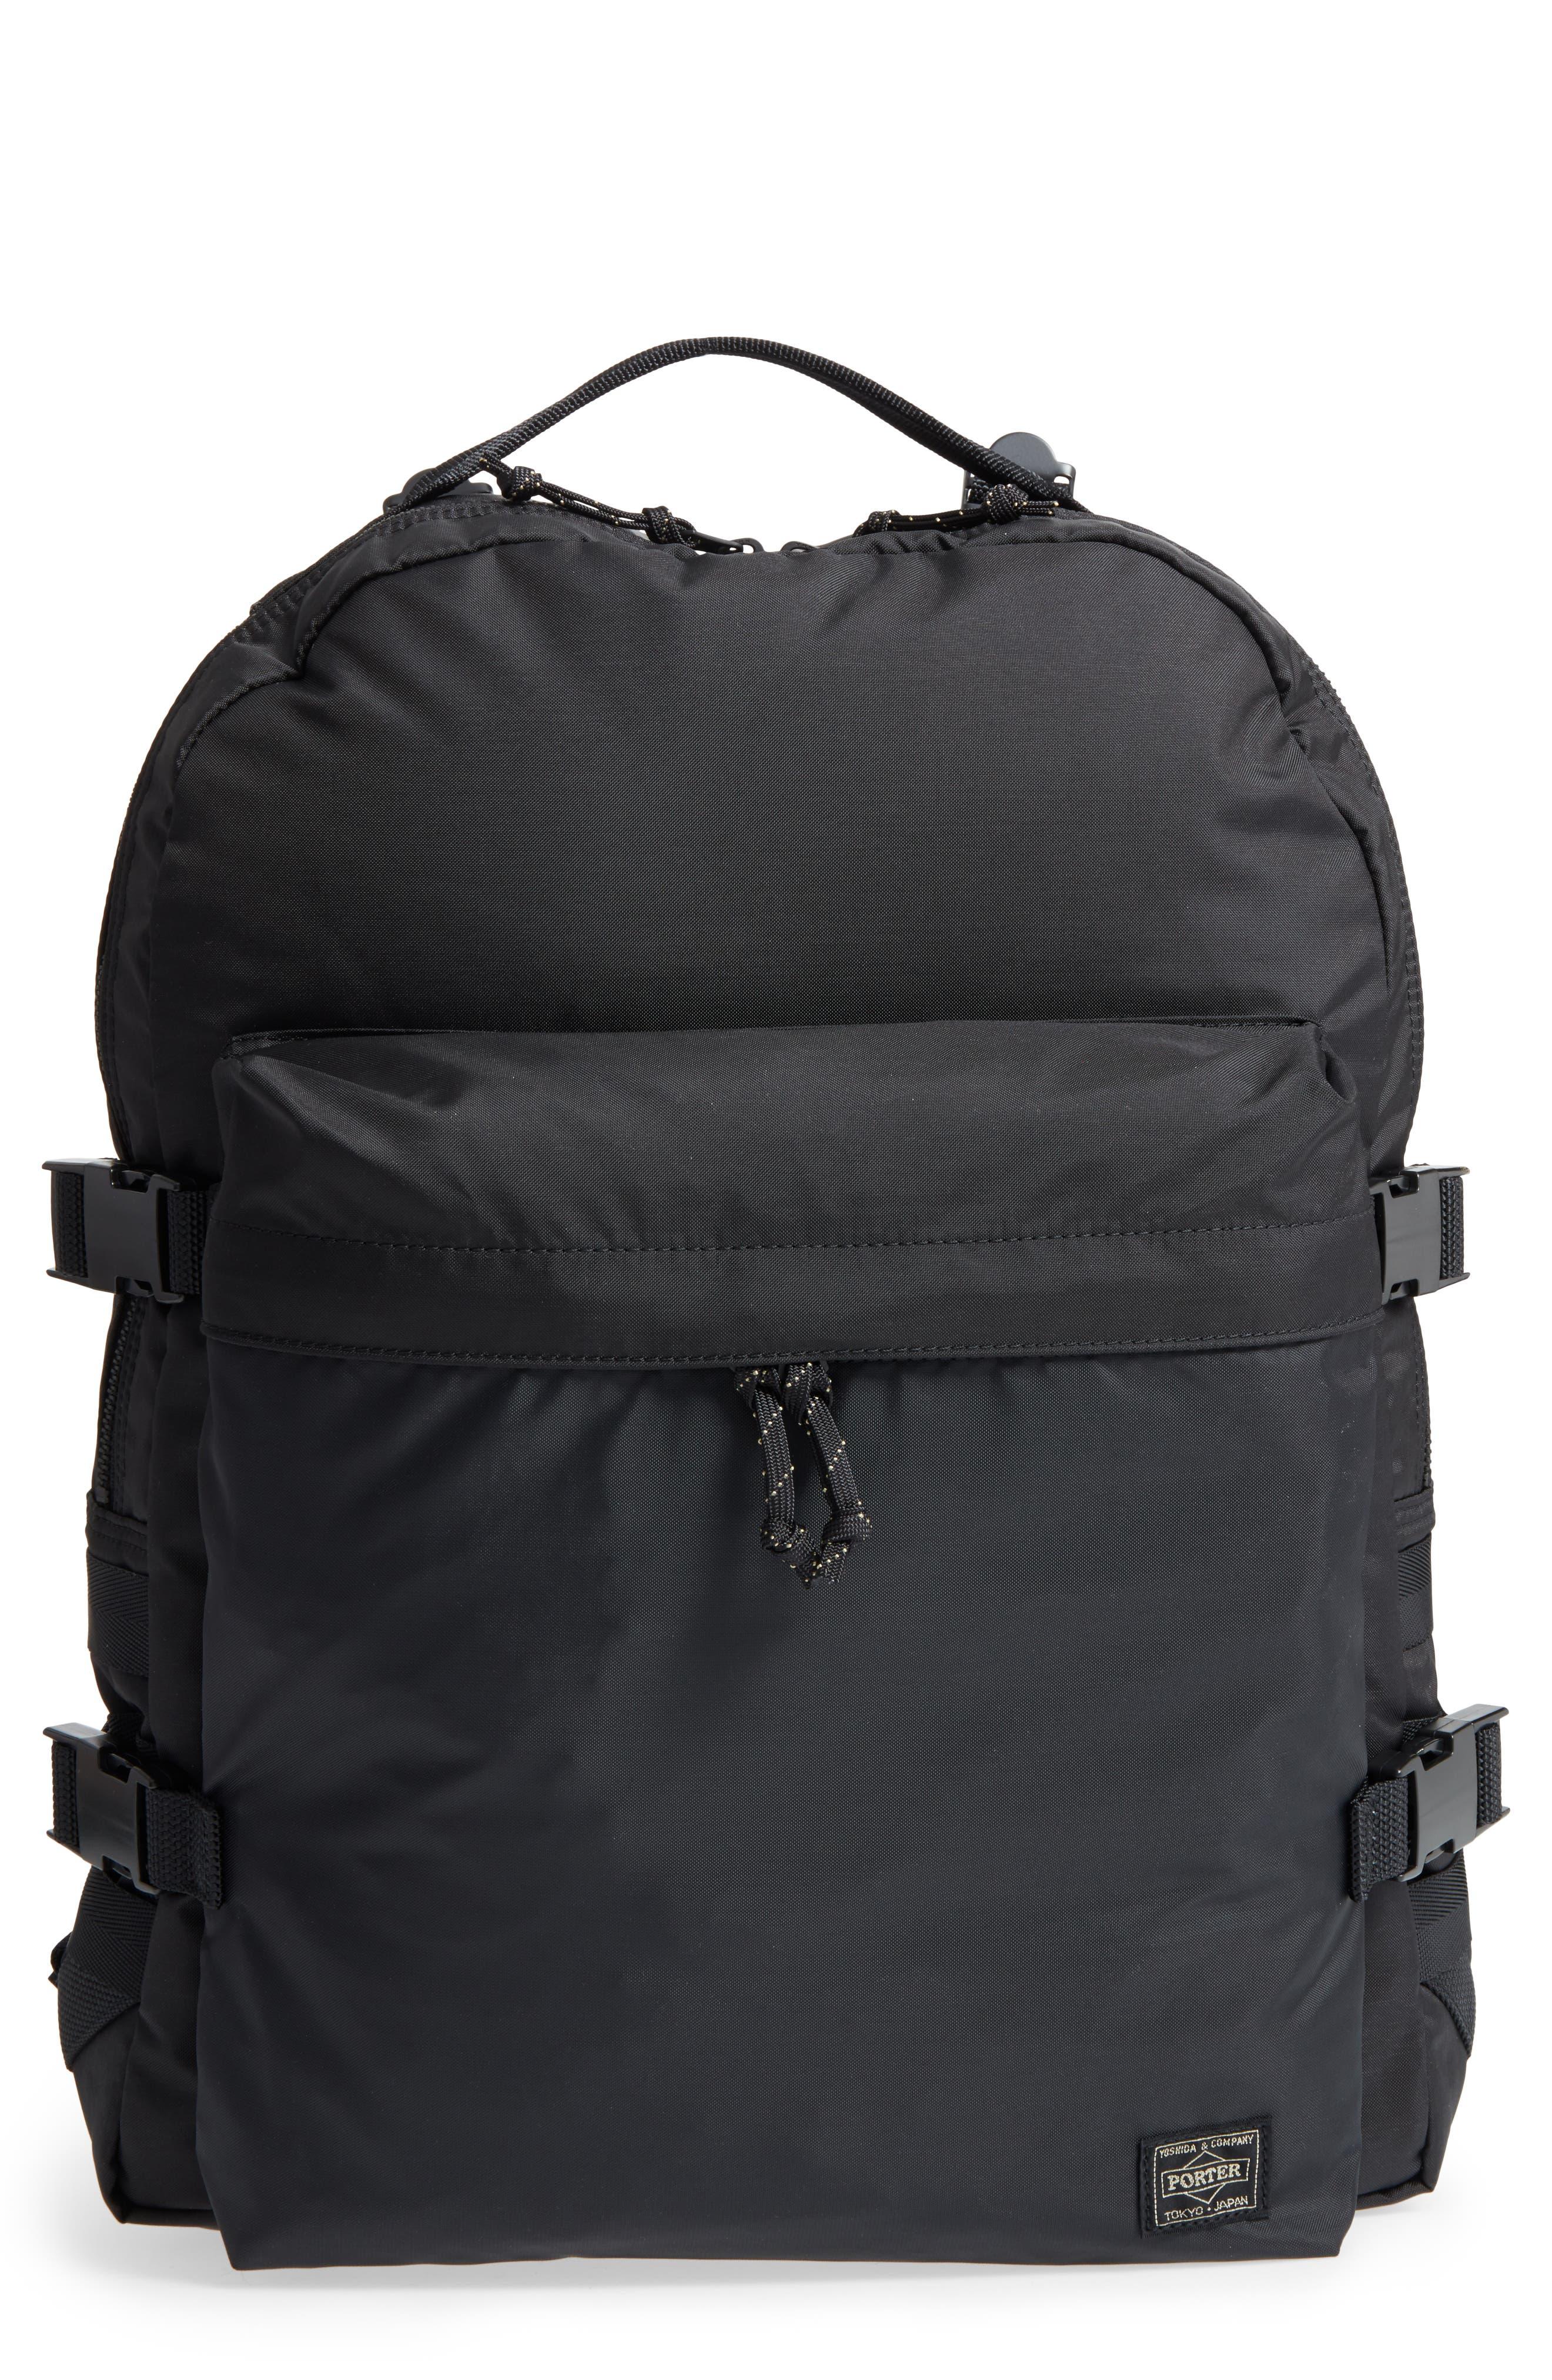 Porter-Yoshida & Co. Force Backpack,                         Main,                         color,